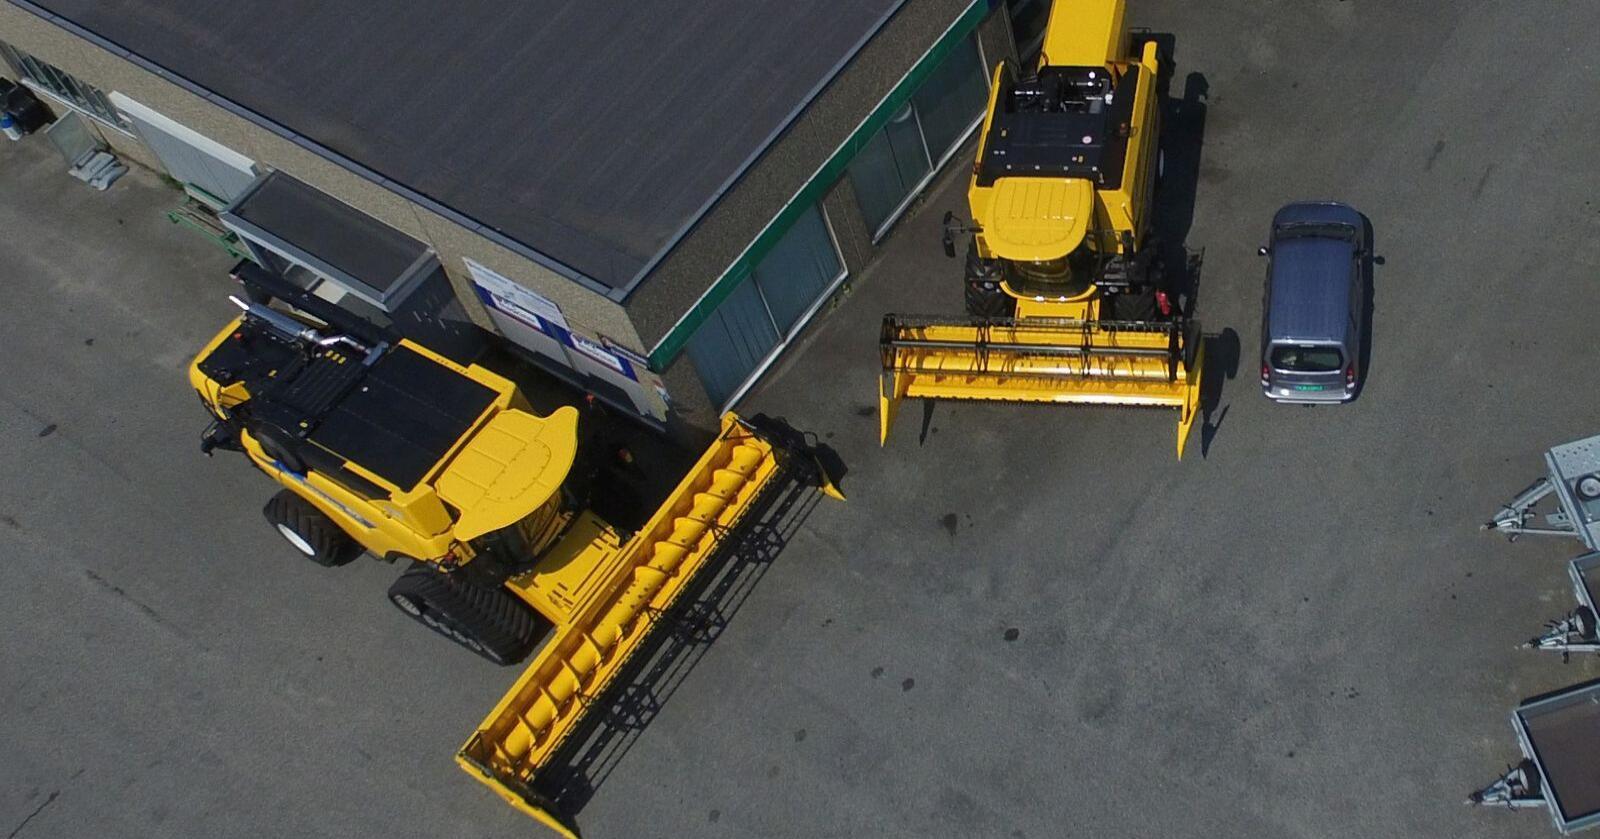 SKURTRESKAR: Den eine større enn den andre. Til venstre New Holland CX 7.90 og til høgre New Holland TC 5.90. Foto: A-K maskiner Nærbø